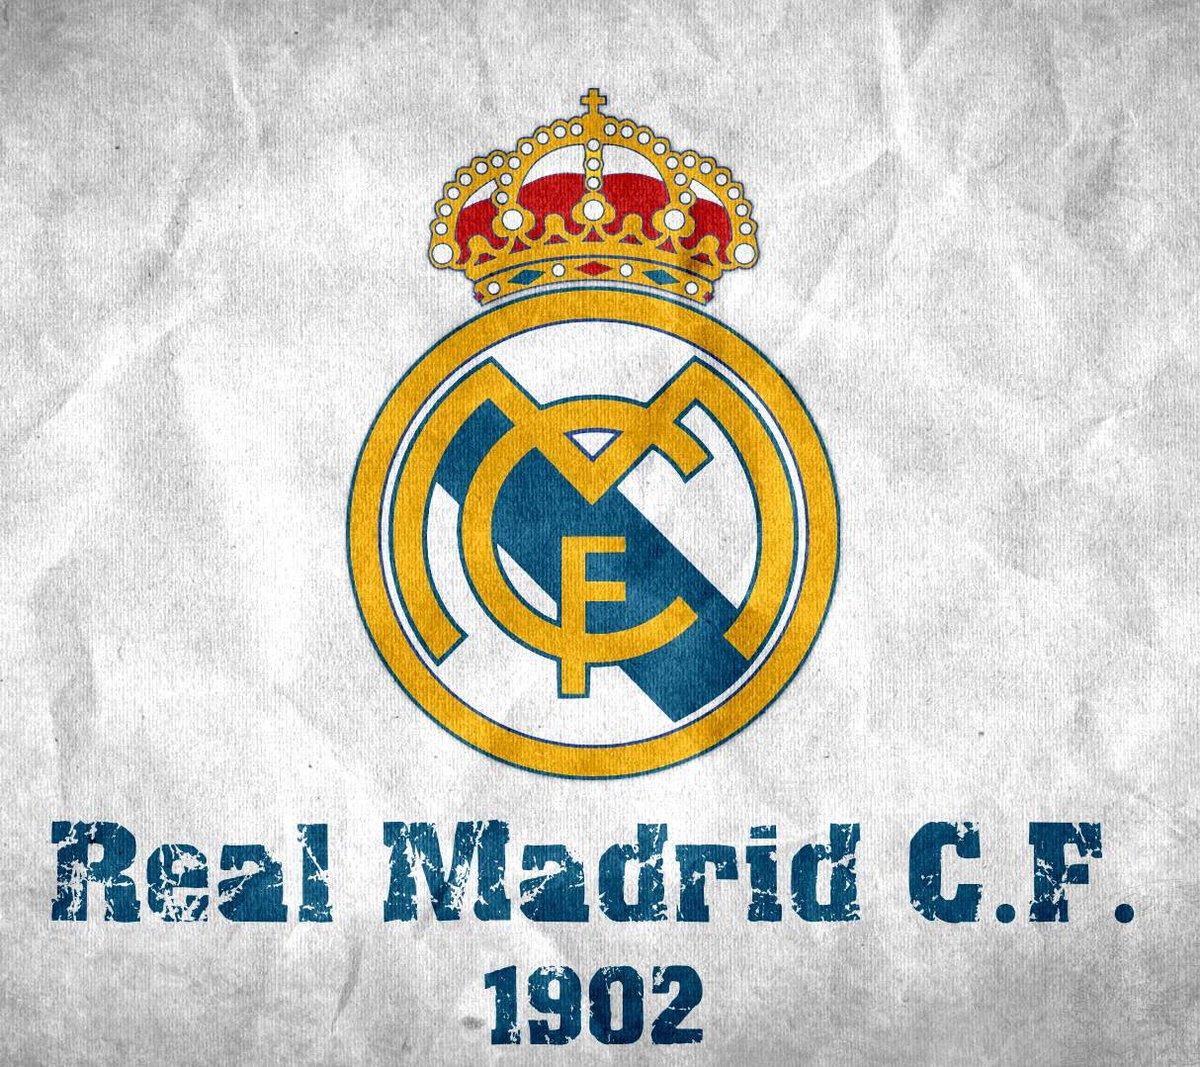 7d0644044761a Libros de futbol on Twitter